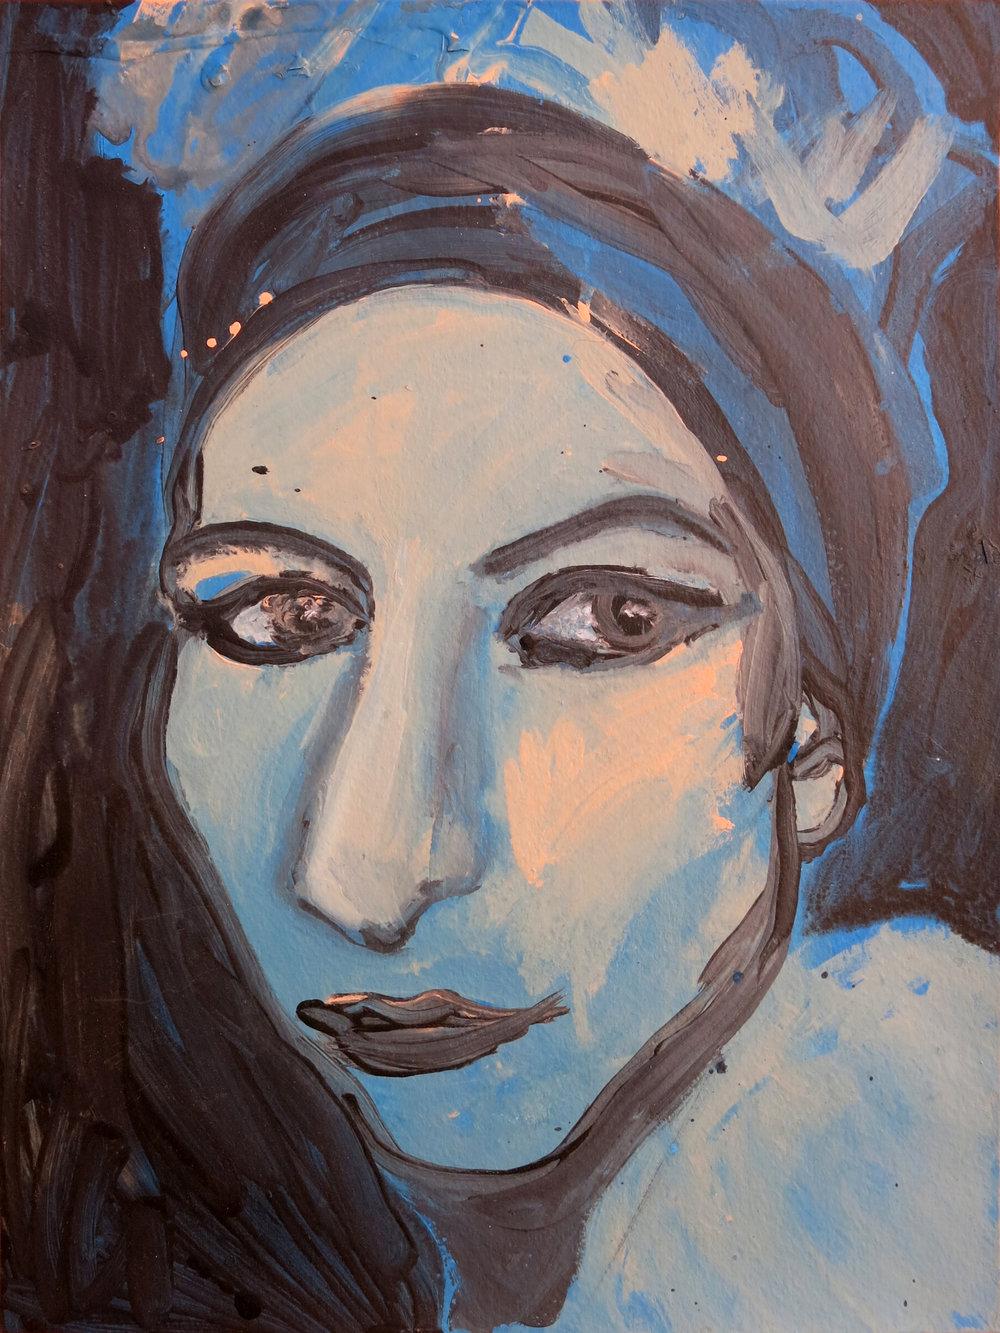 Barbra Streisand Portrait #58